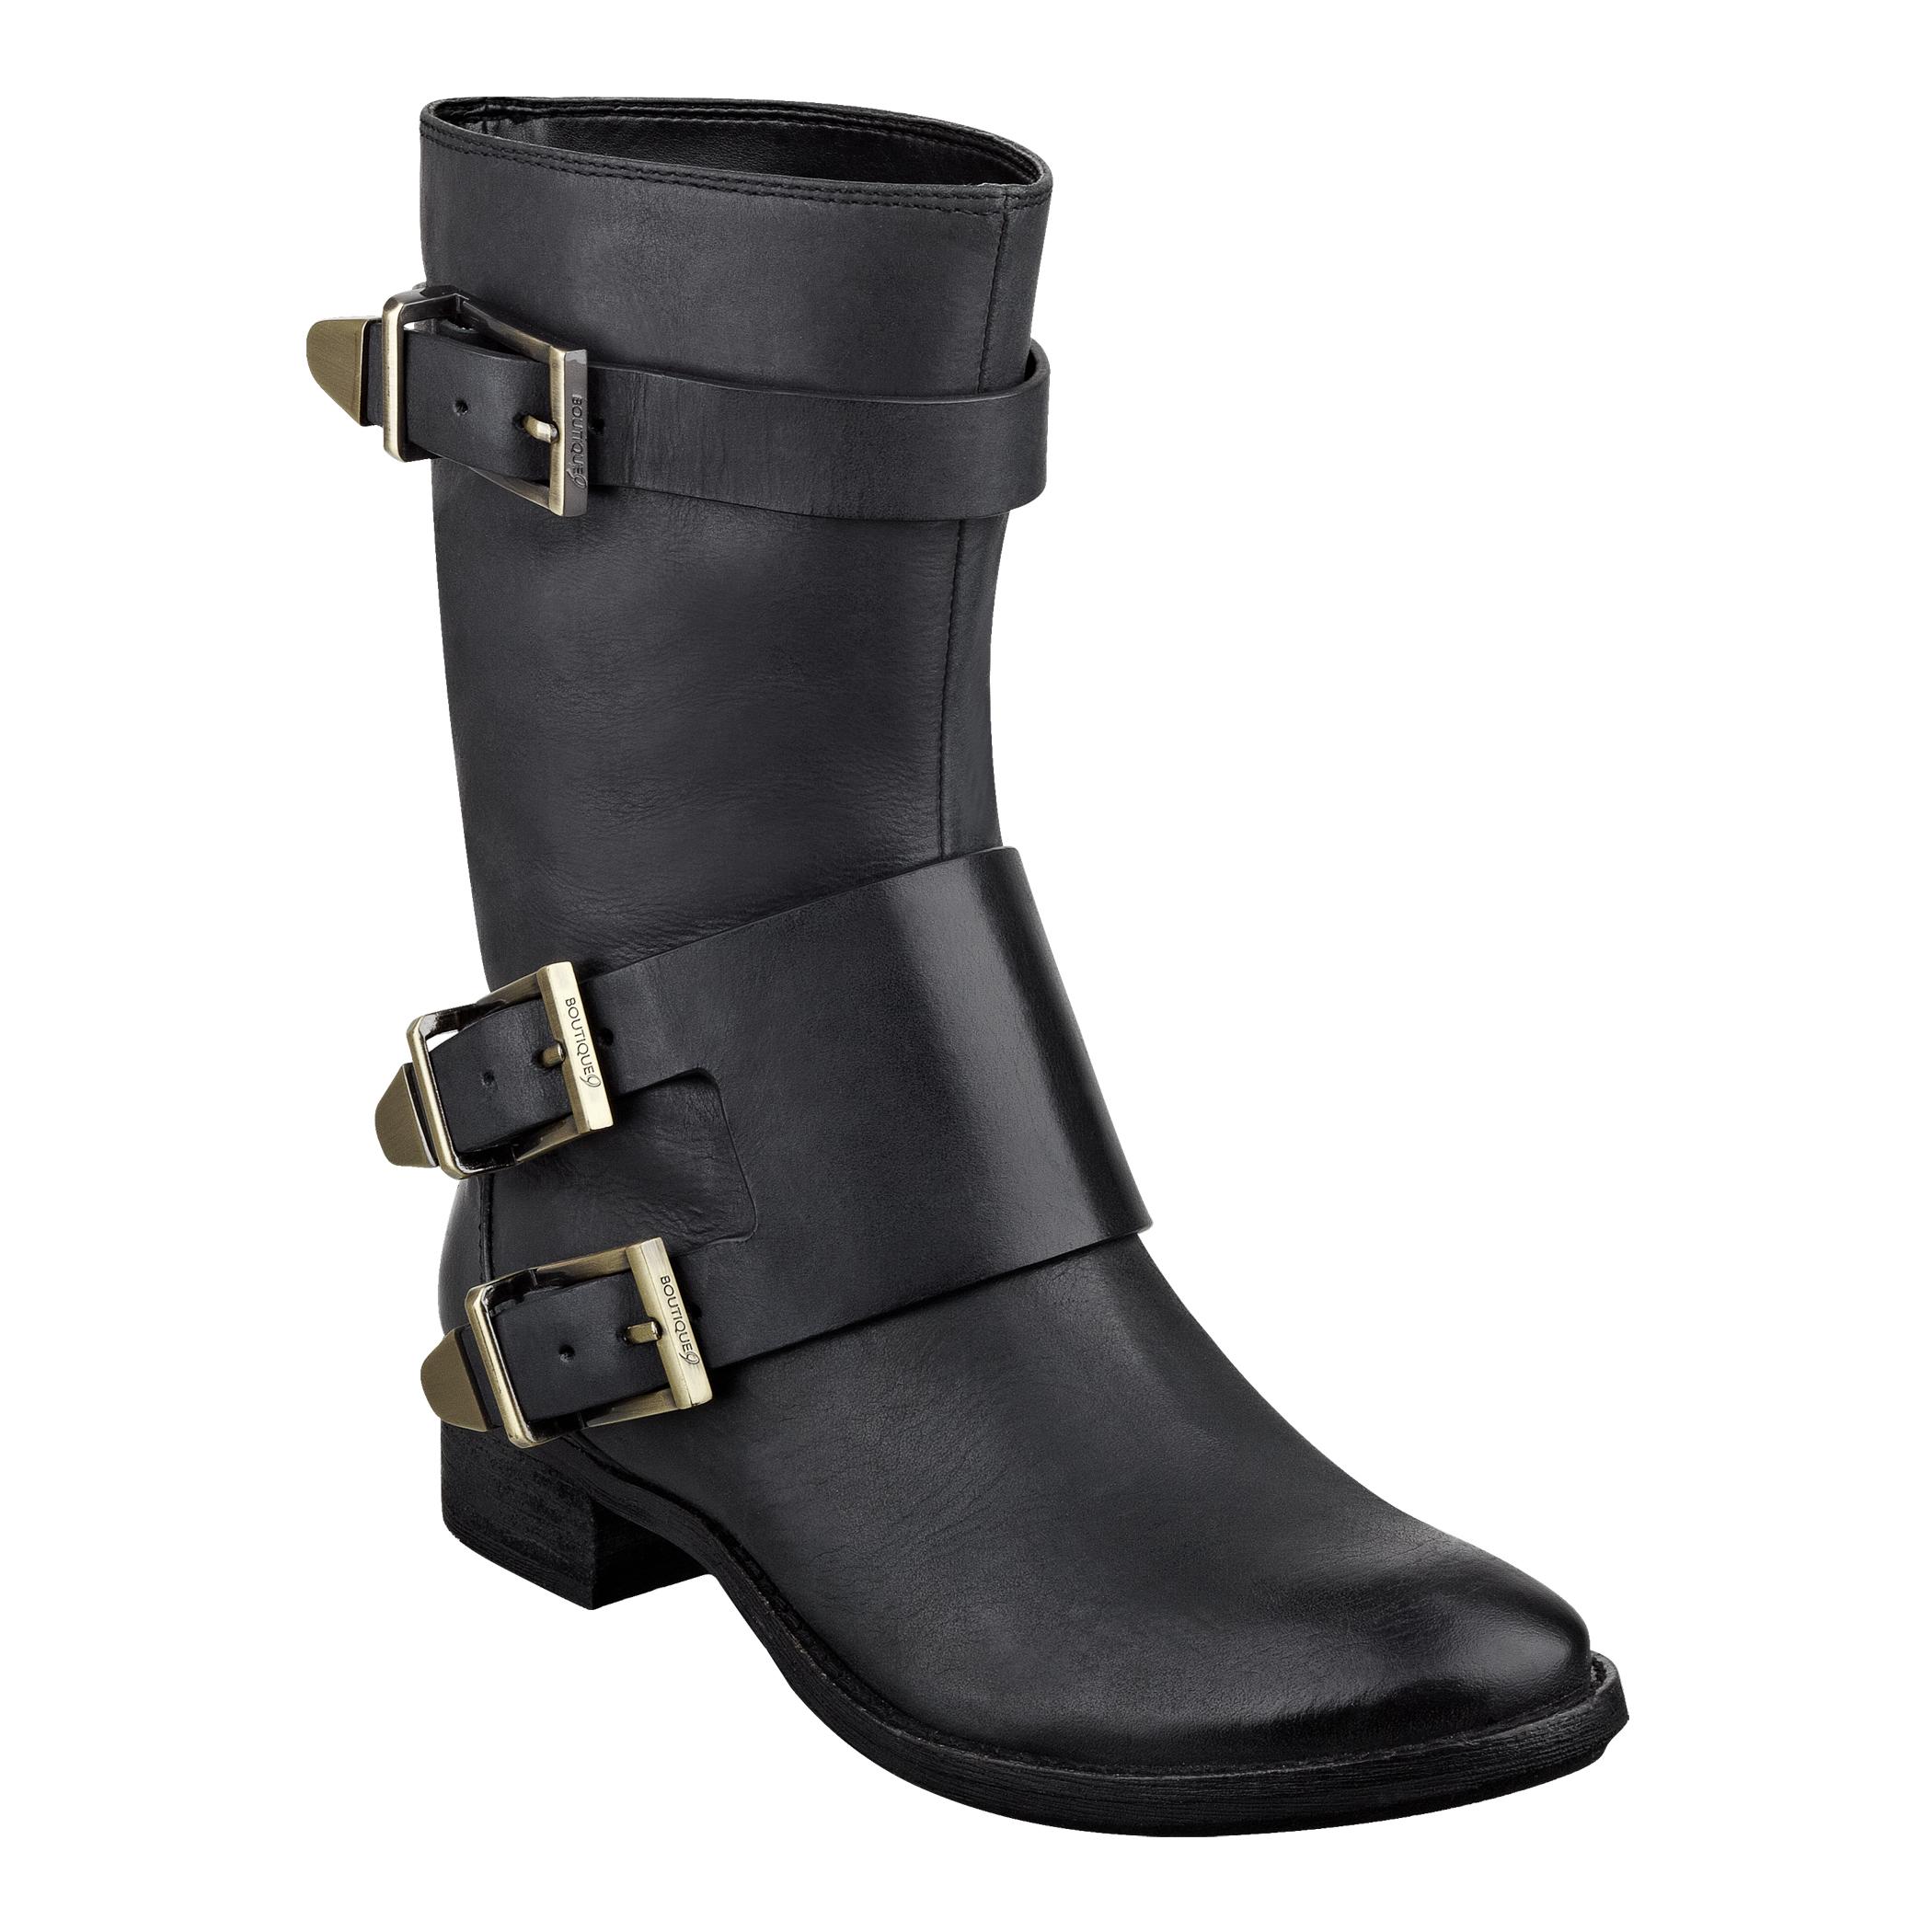 Nine West: Shoes > All Booties > RADANNAH PULL-ON BOOTIES   - BOOTIES